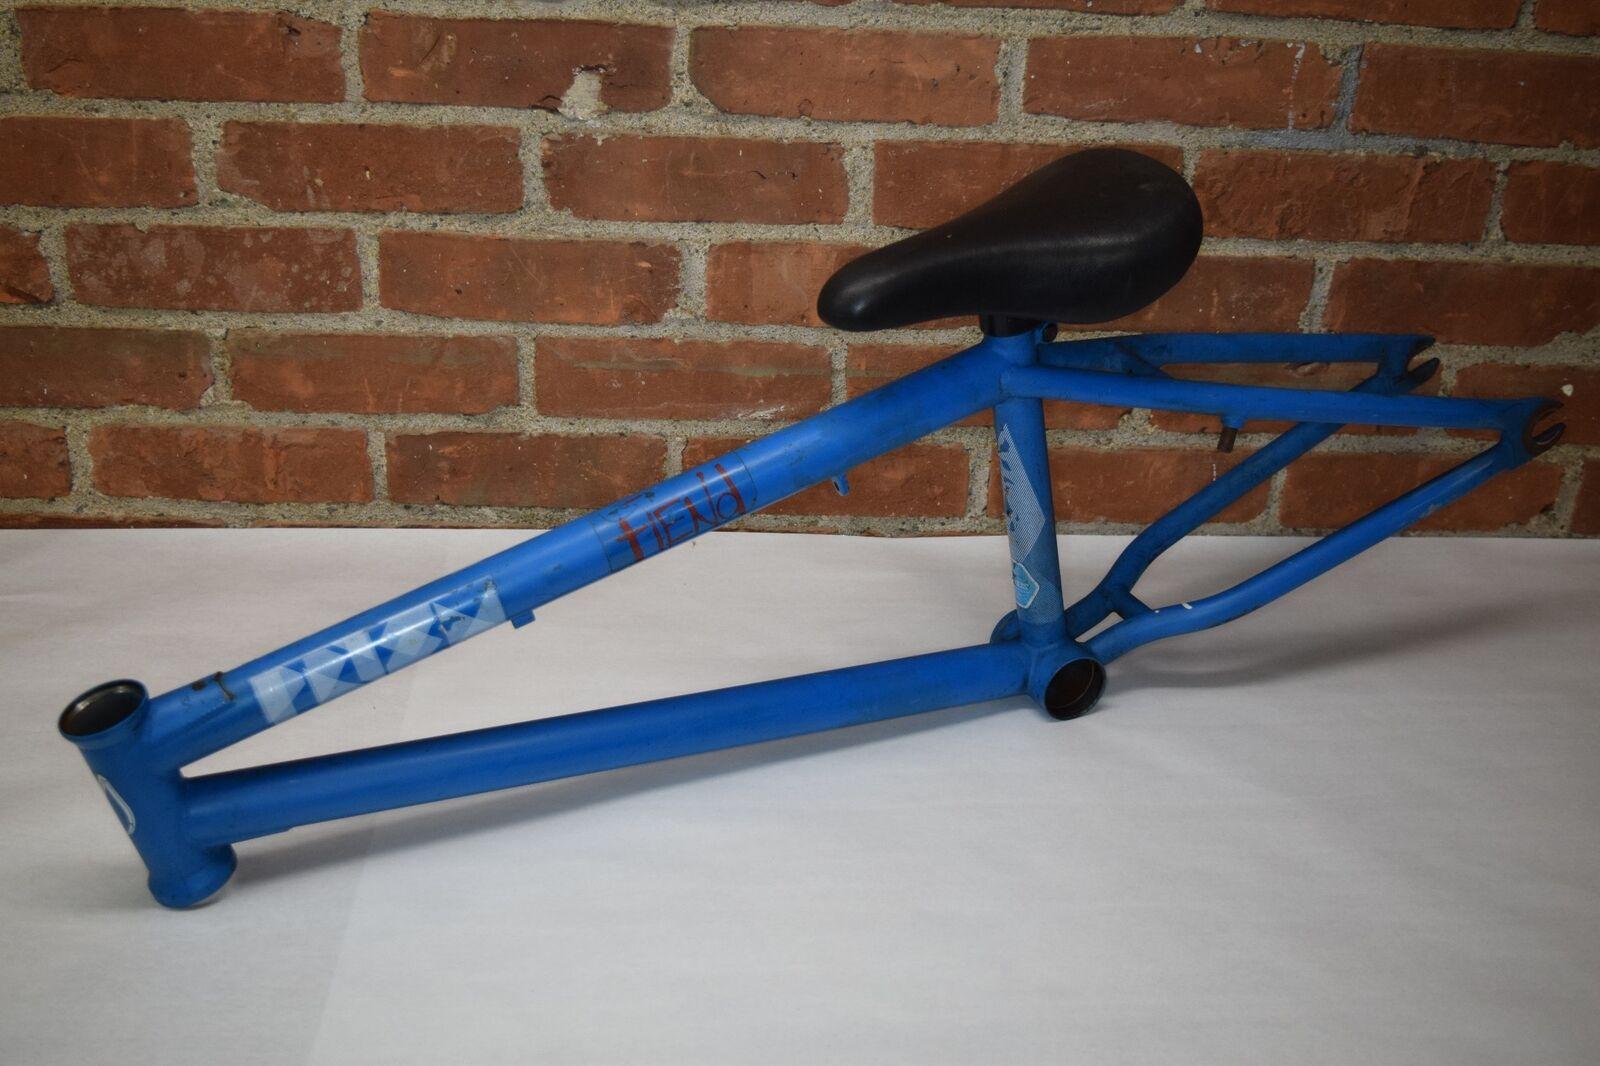 verde Prism cuadro de BMX Azul (Eastern Fit Kink Stolen Cult Odyssey S&M)